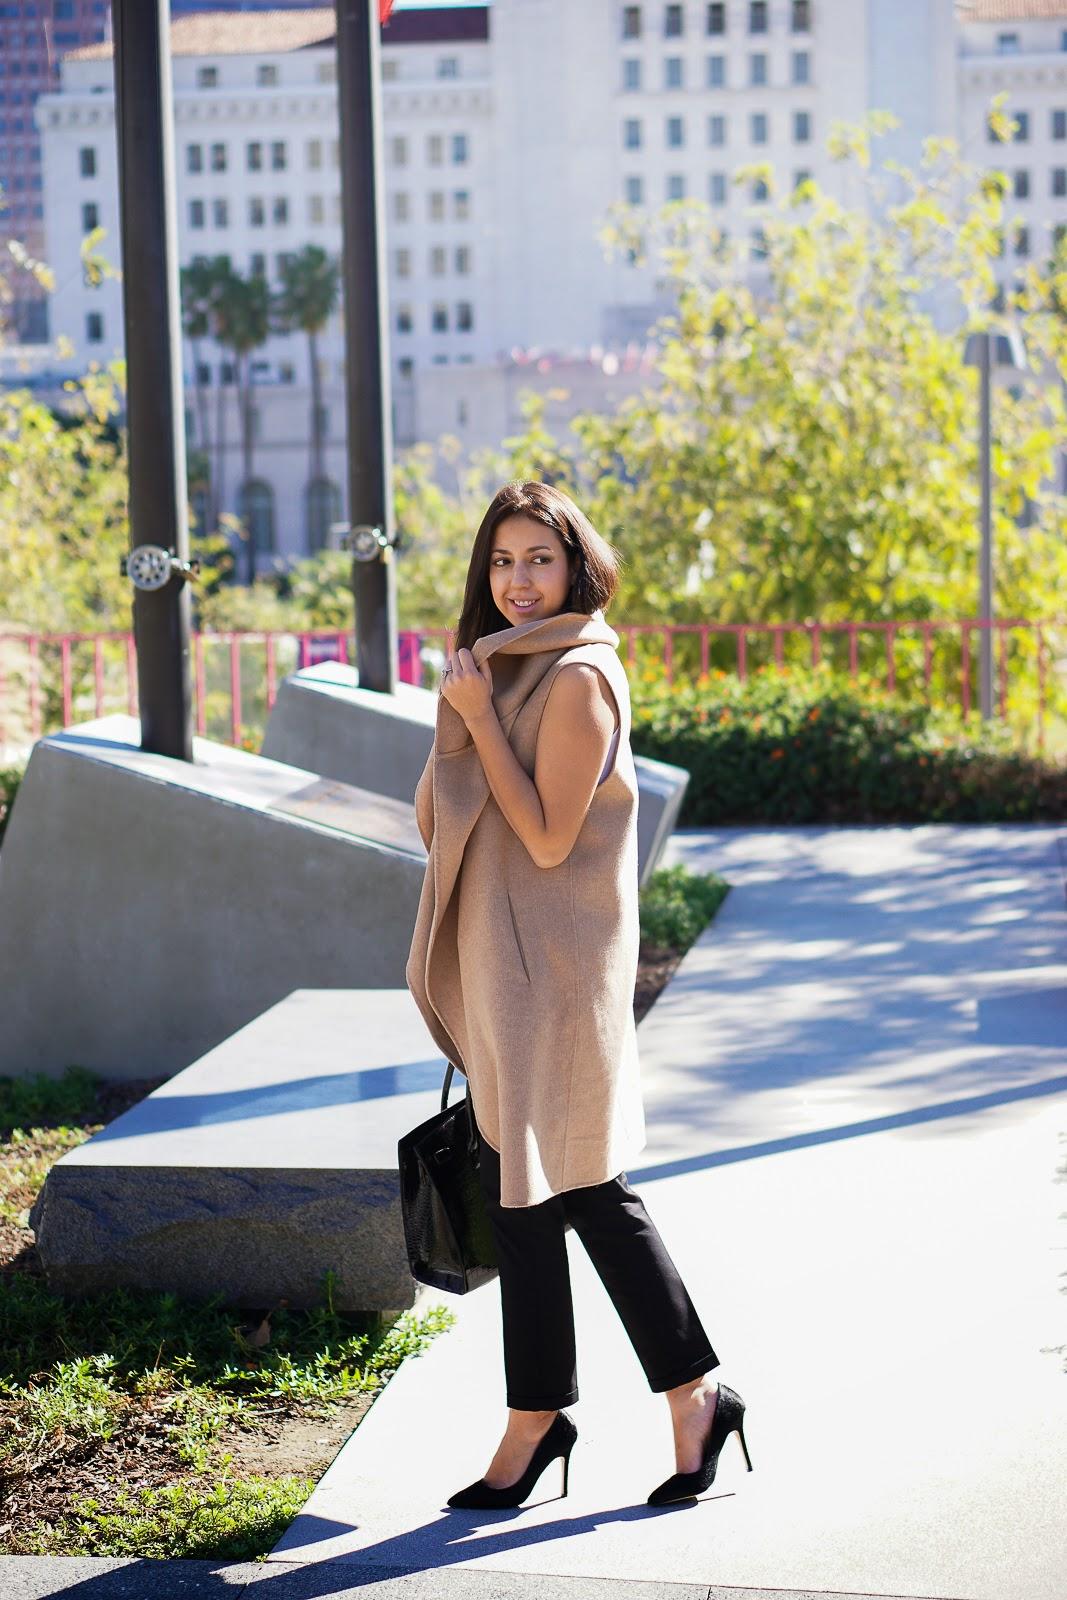 Lookbook, Zara Camel Vest, Camel Vest, Zara Vest, Shoemint Heels, Black Heels, Black Pumps, Aldo Bag, Zara Hand Made Long Waistcoat, Zara Camel Waist Coat, How to Style a Camel Vest,